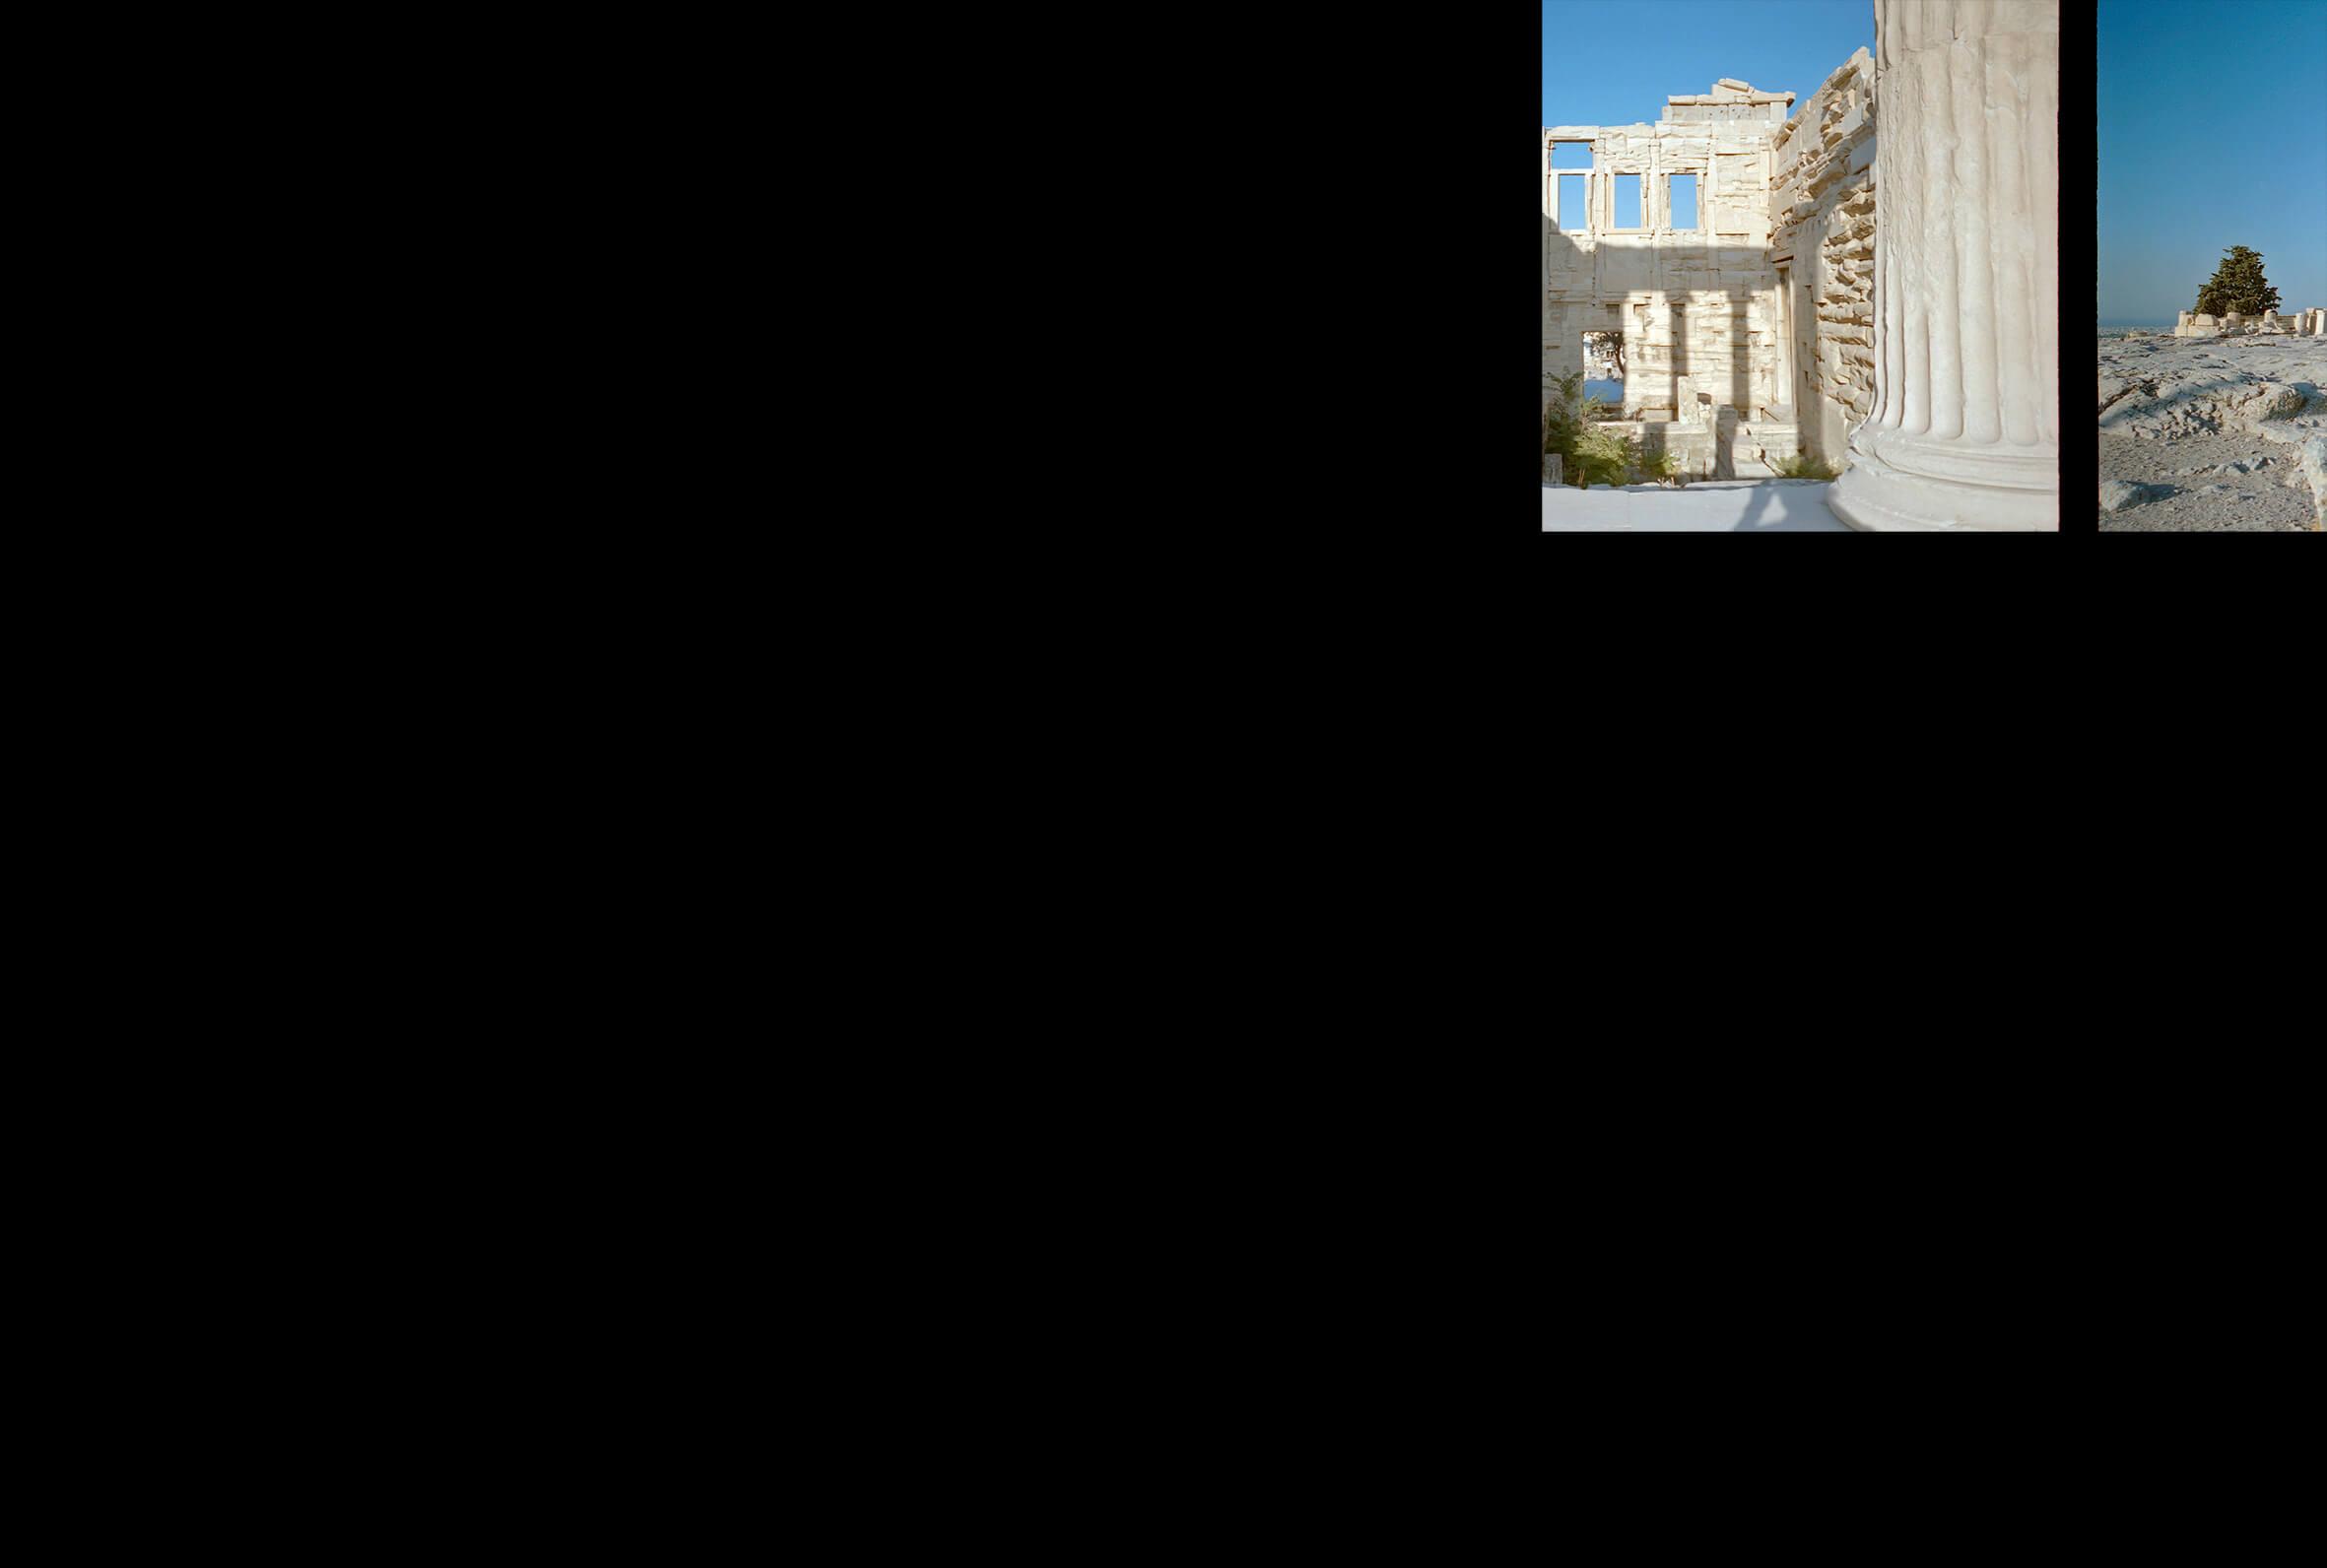 "Libro de horas: Lunes [""Book of Hours: Monday""], 2020. (Detail)   Diario de sucesos poco notables [Journal of (un)remarkable events]   ProjecteSD"